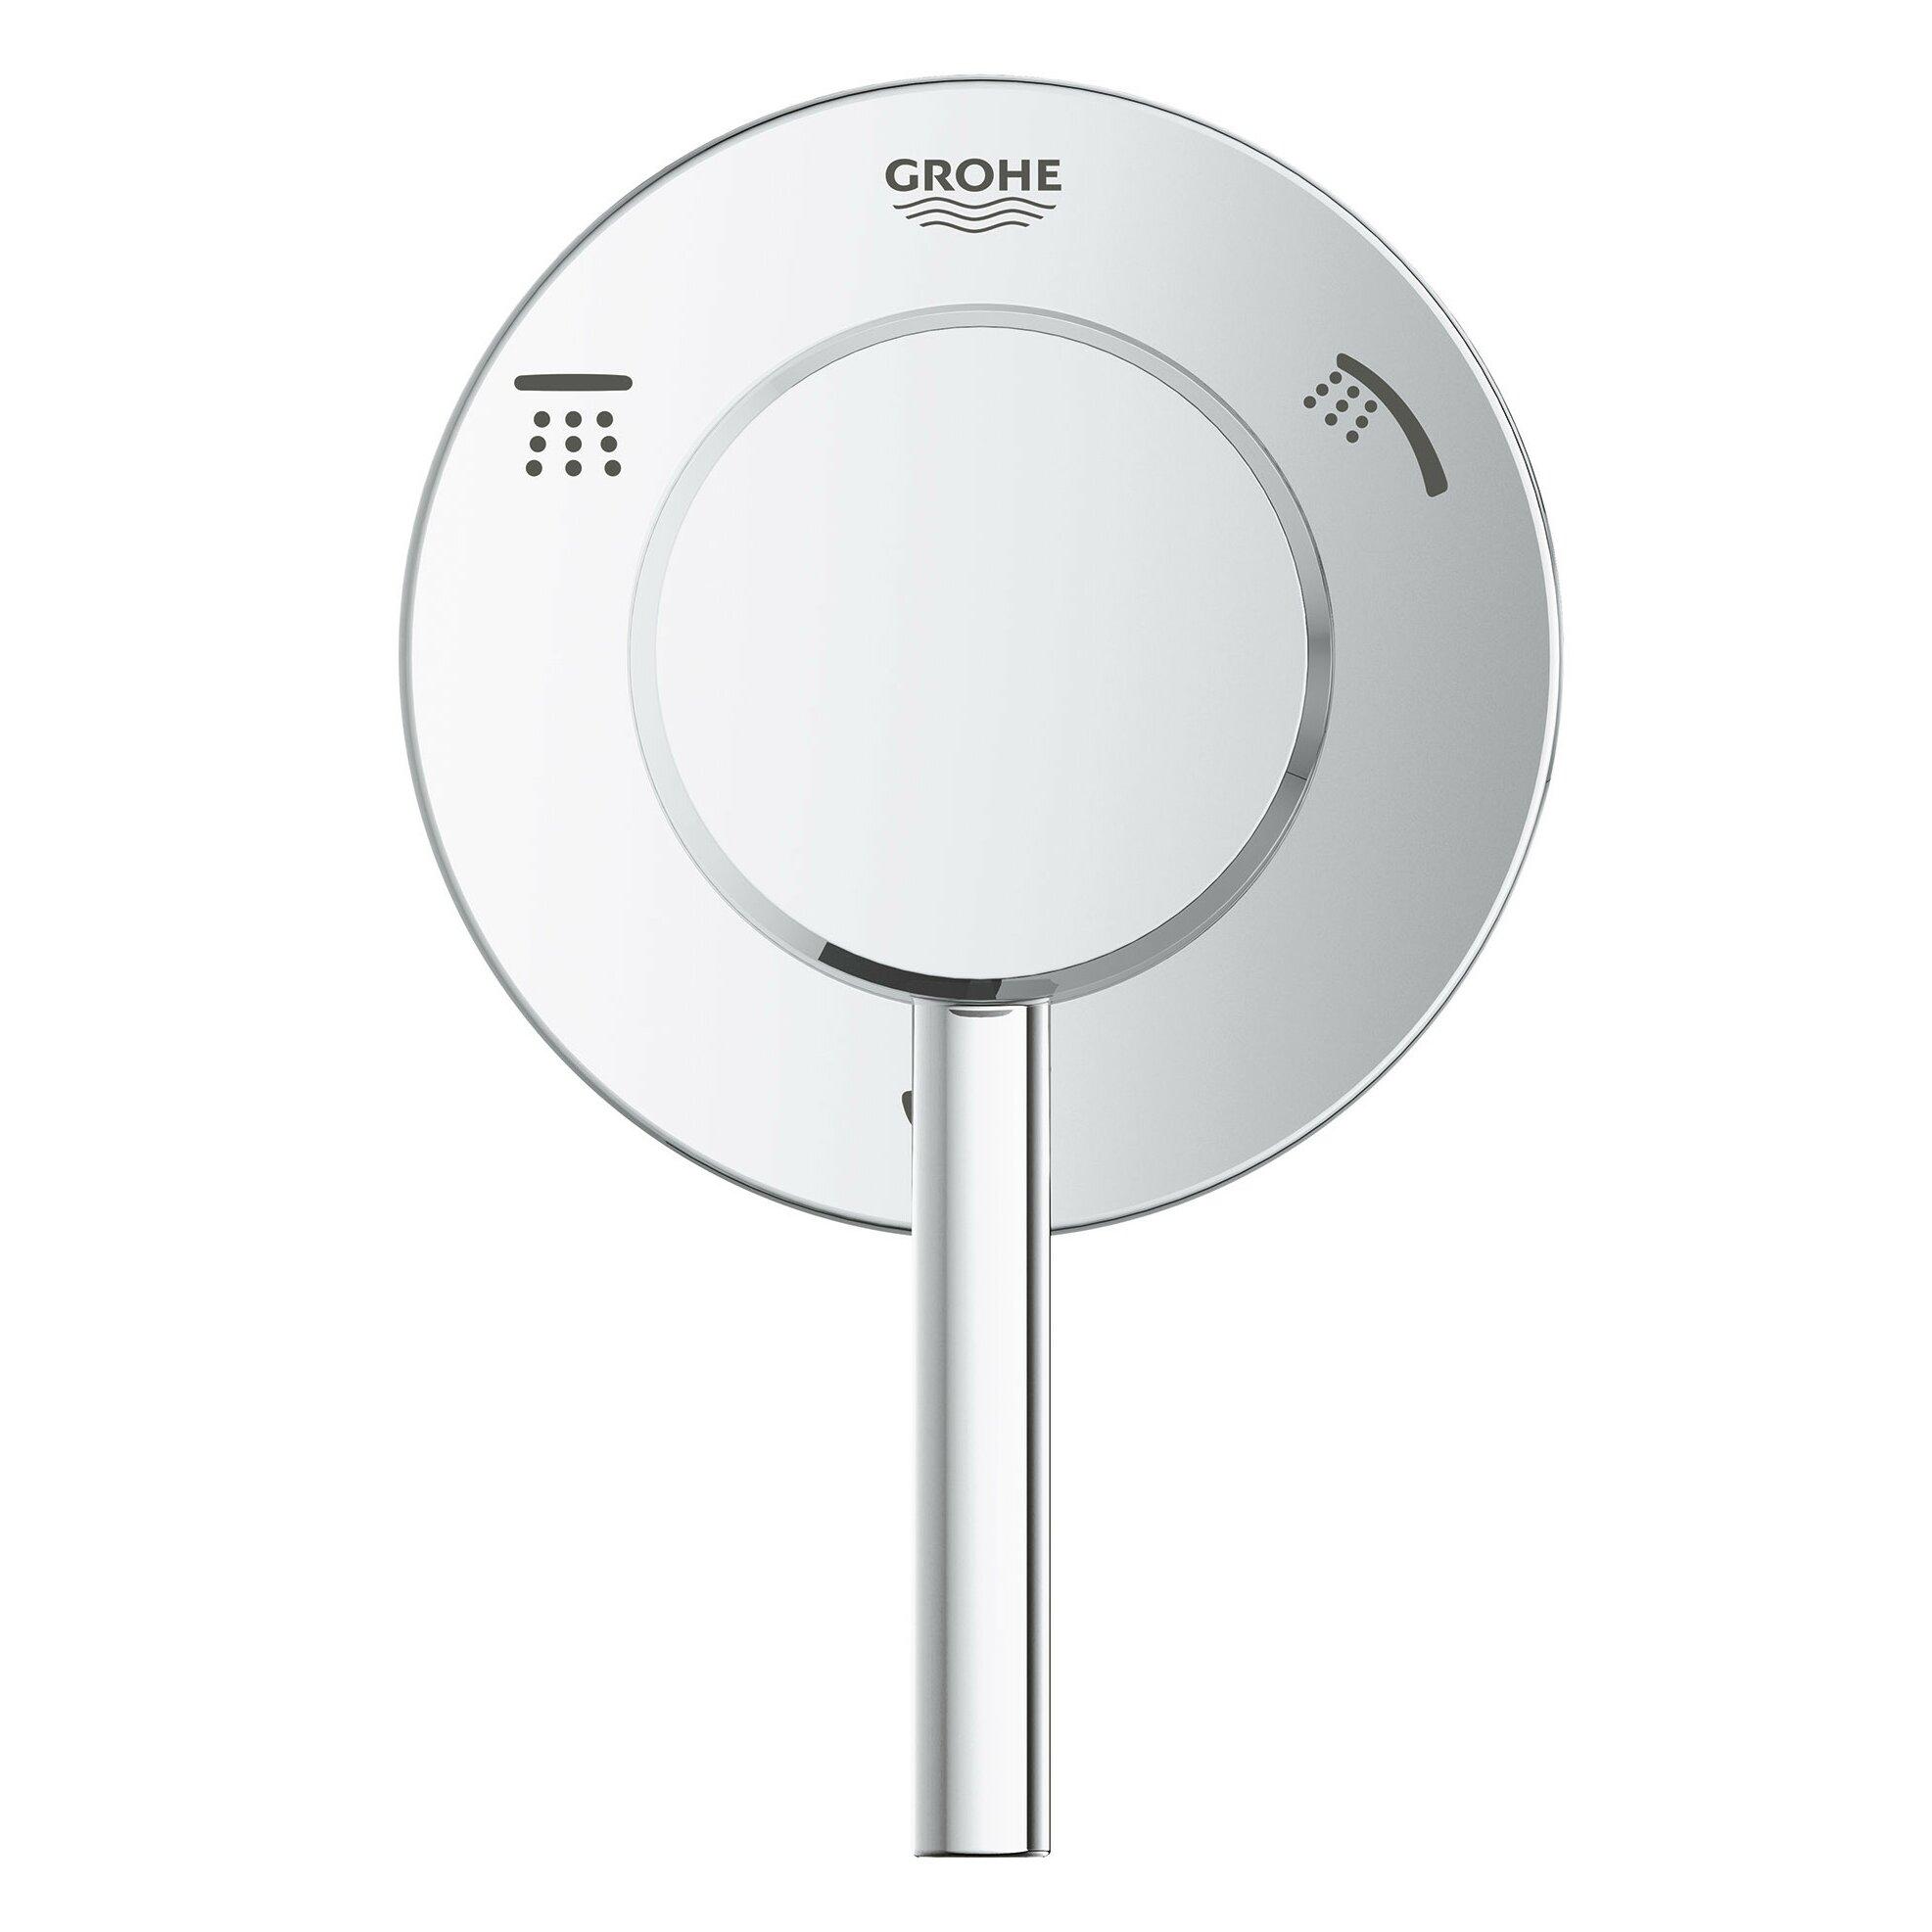 Grohe Concetto Kitchen Faucet Grohe Concetto Single Handle 3 Way Diverter Shower Faucet Trim